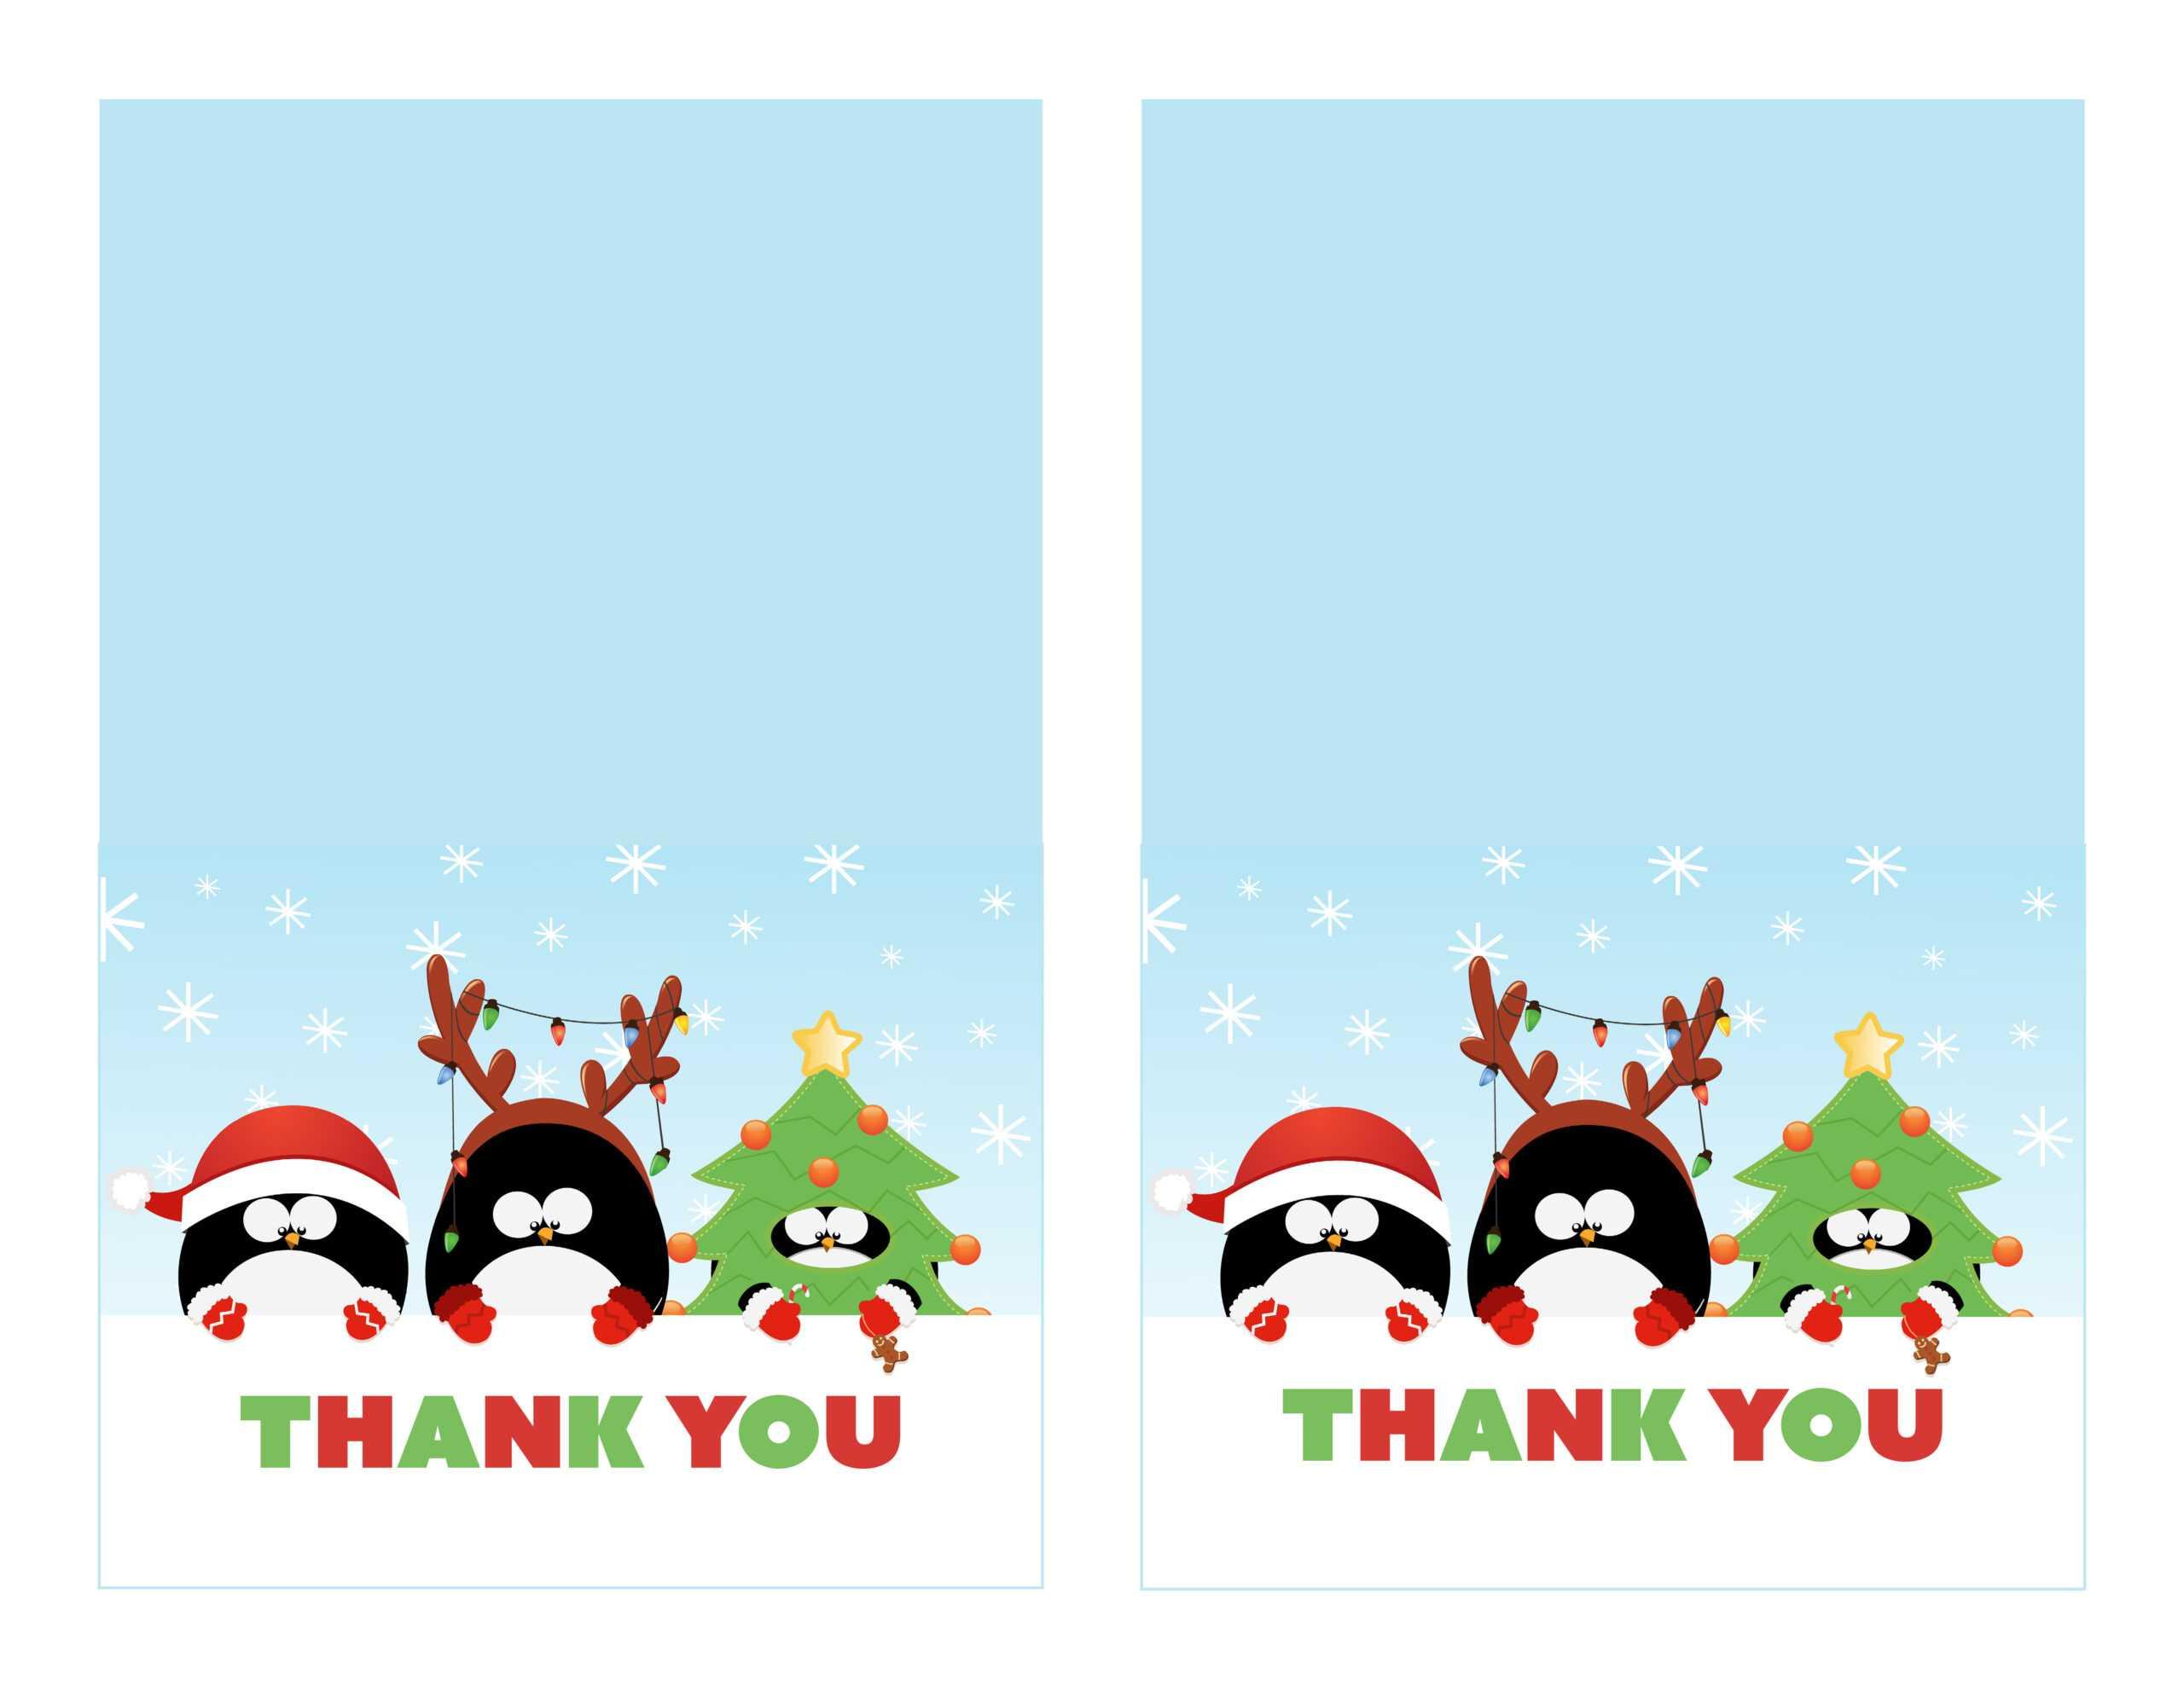 36 Adding Christmas Thank You Card Templates Free Download Intended For Christmas Thank You Card Templates Free